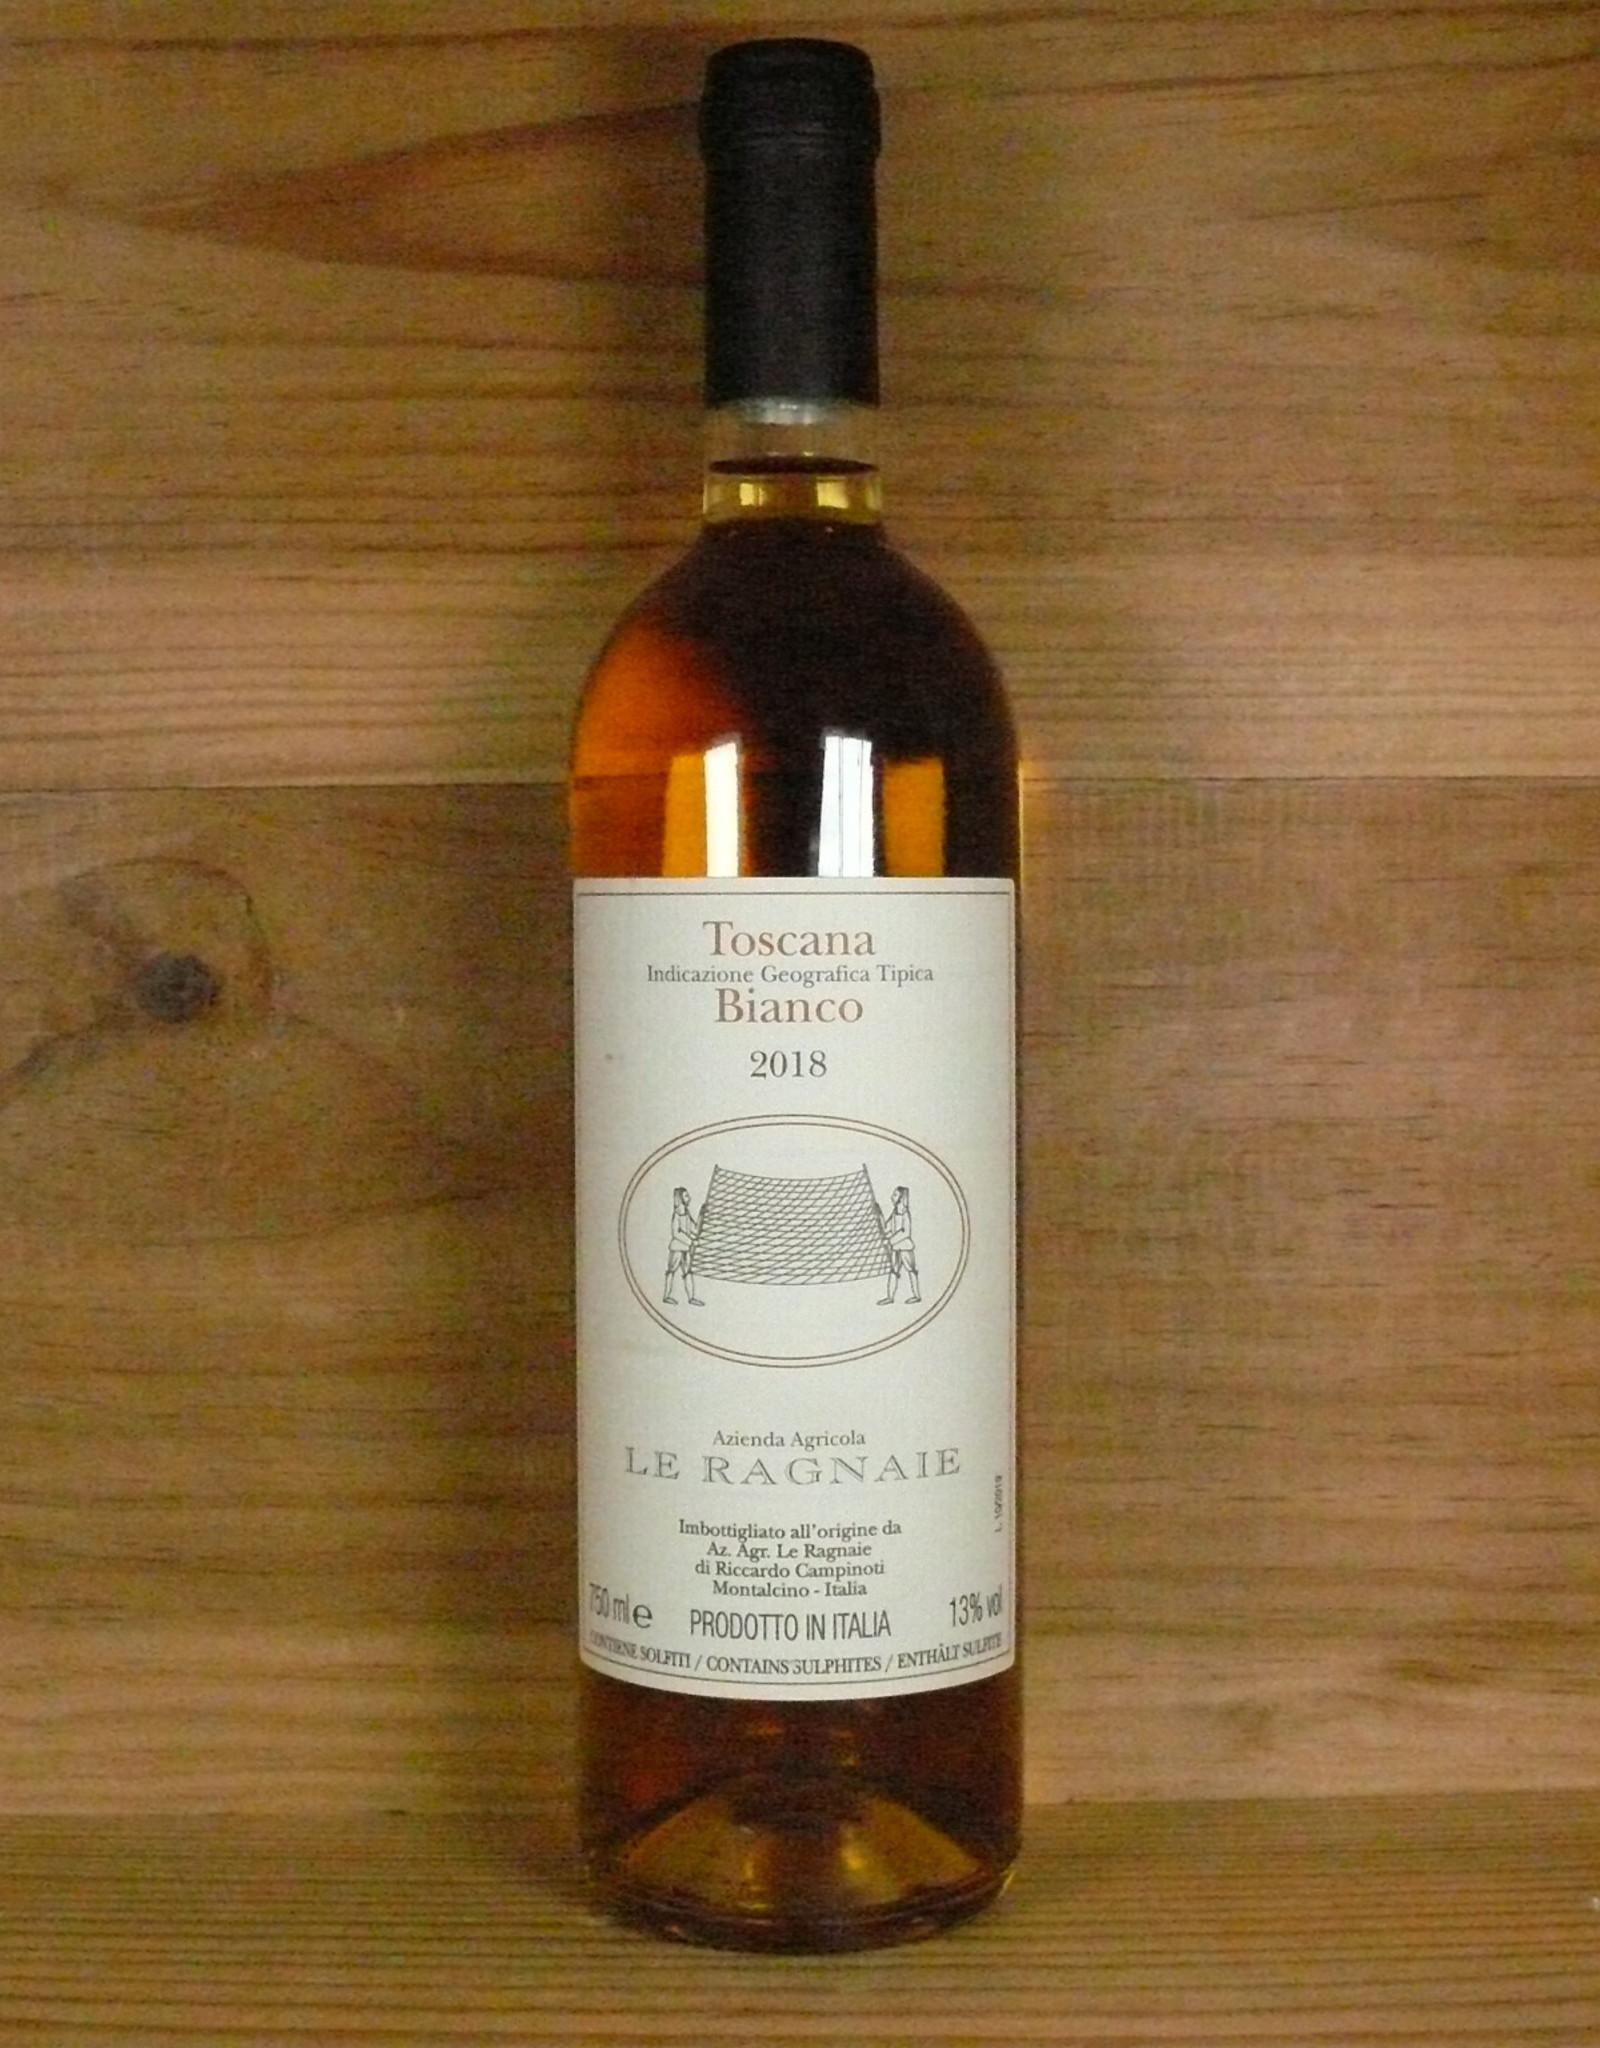 La Ragnaie - Toscana Vino Bianco 2018